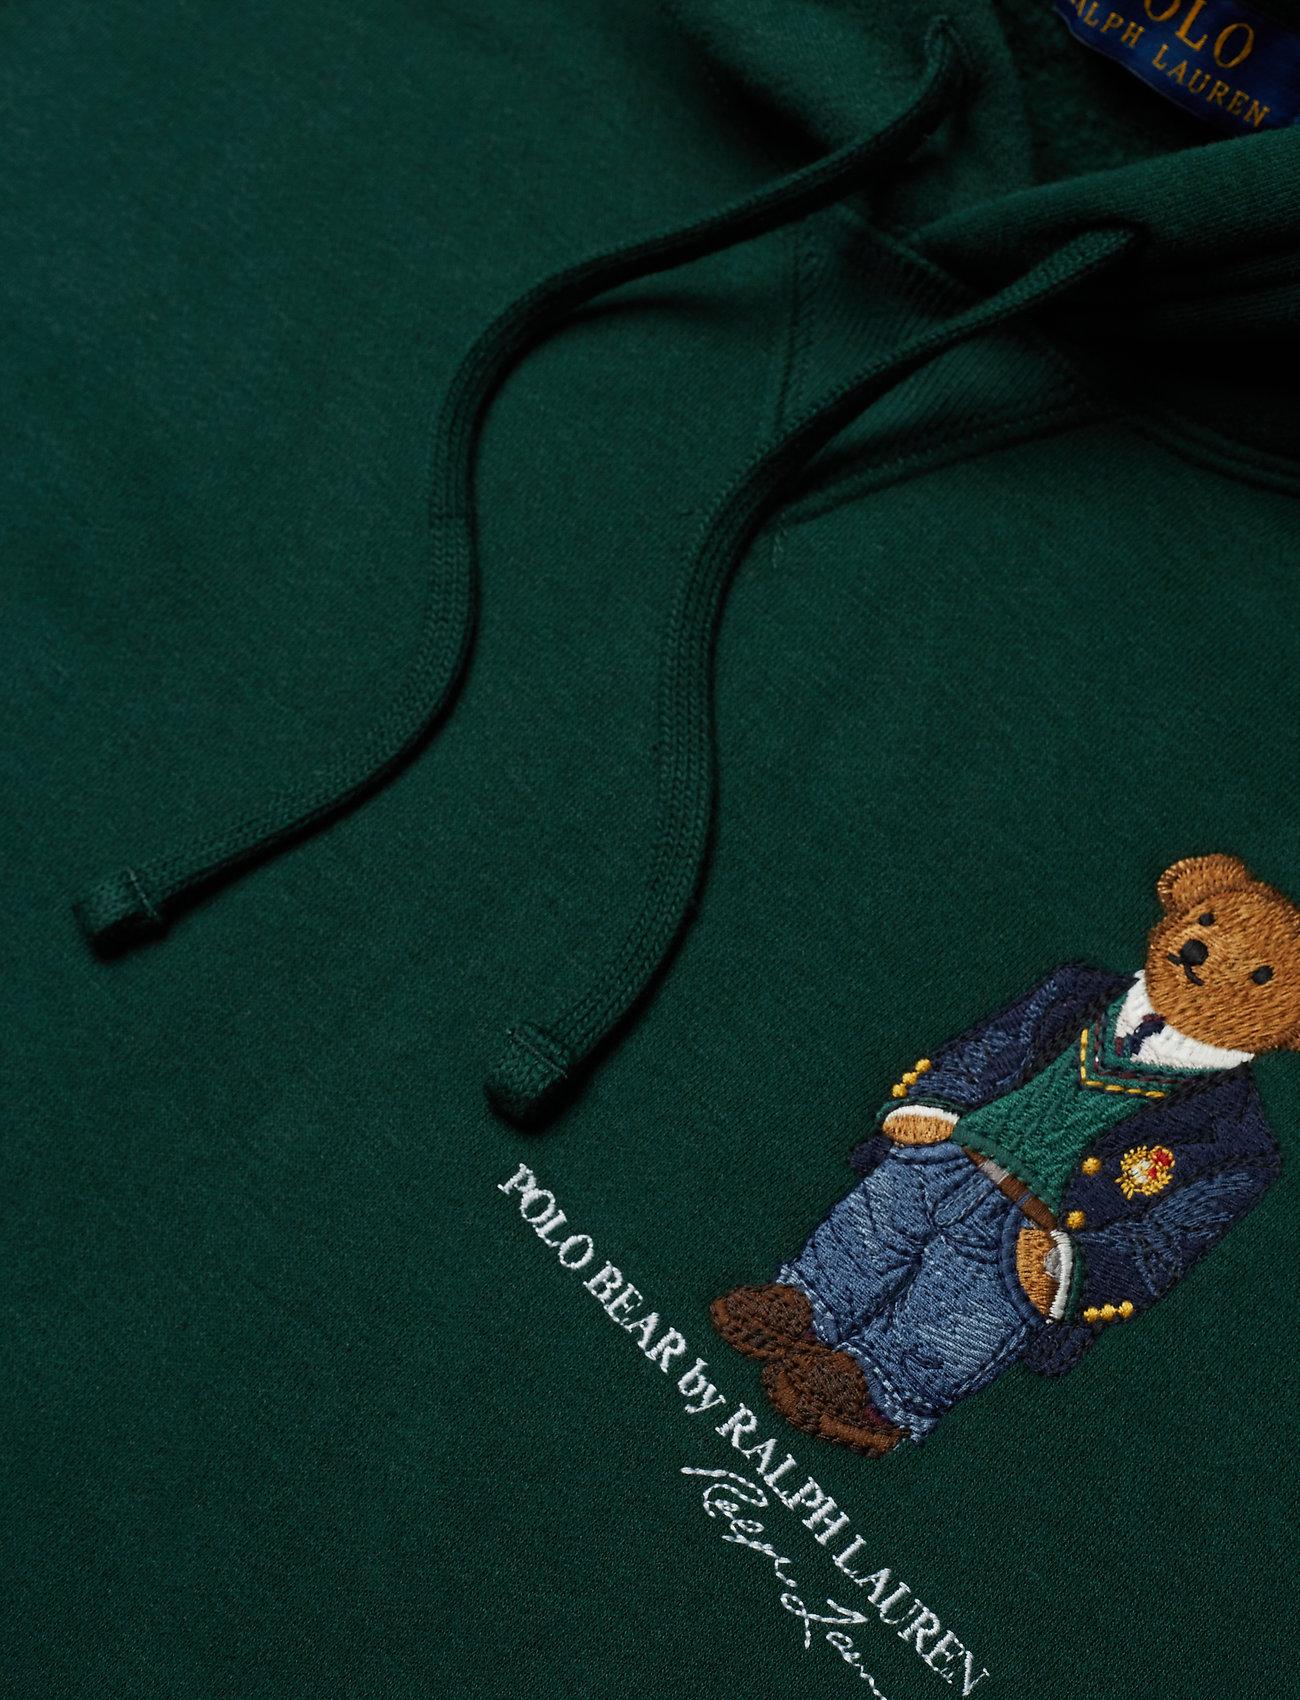 Lspohood M3 Ralph Sleeve knitcollege GreenPolo long Lauren MVSzqUp